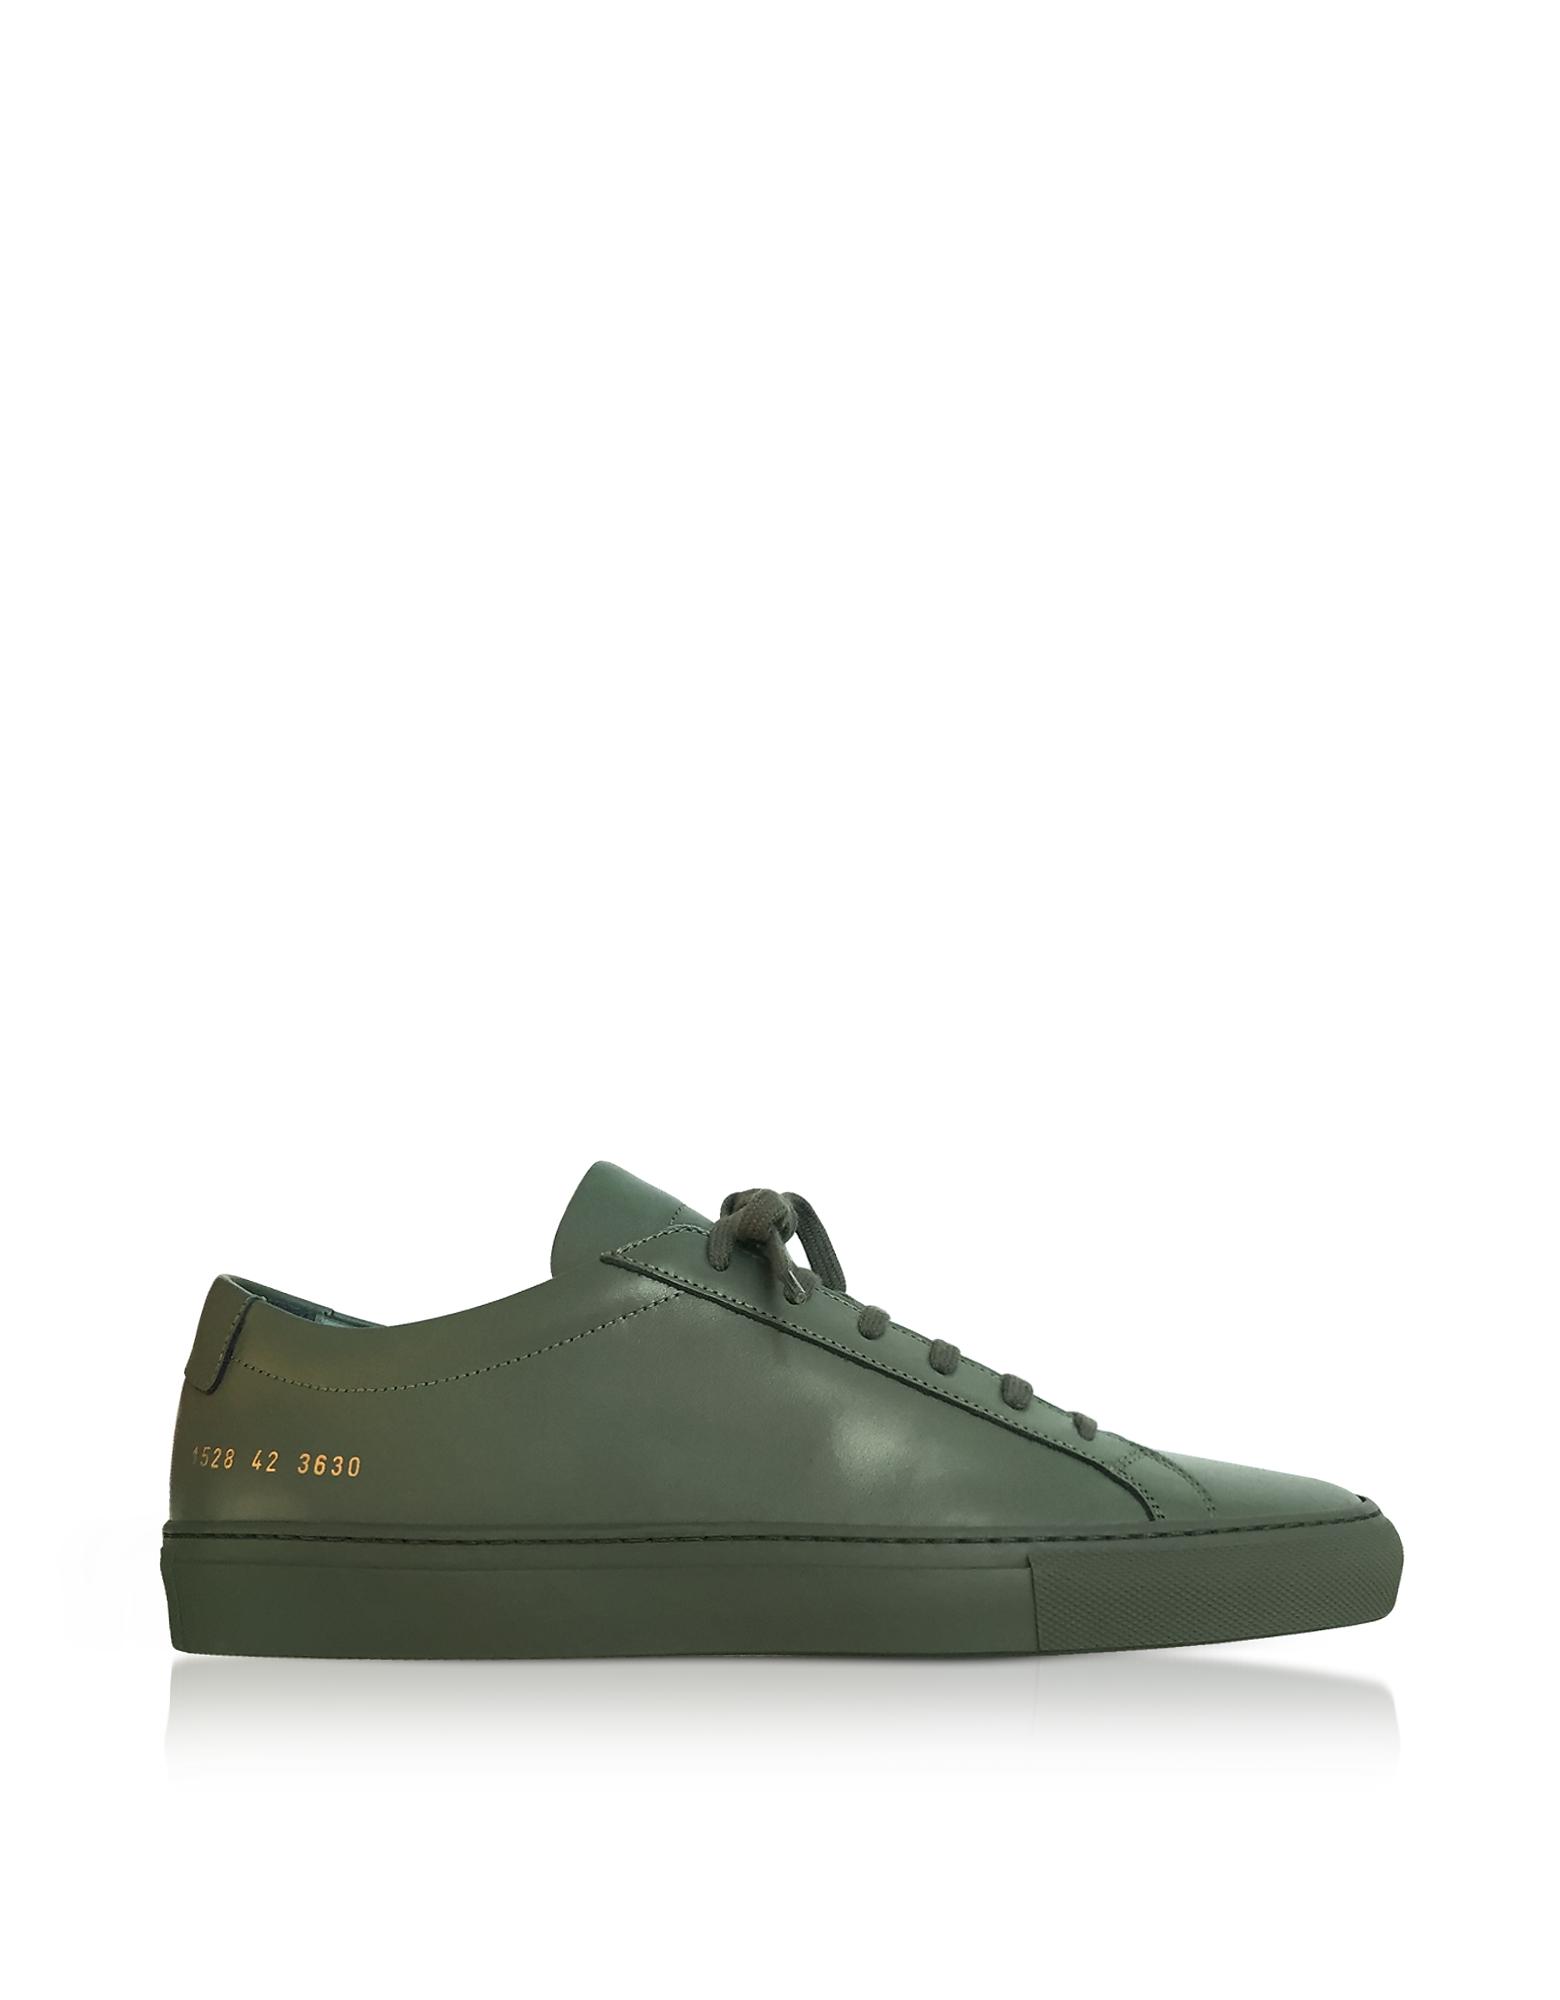 Original Achilles Sneakers Low Top da Uomo in Pelle Verde Army